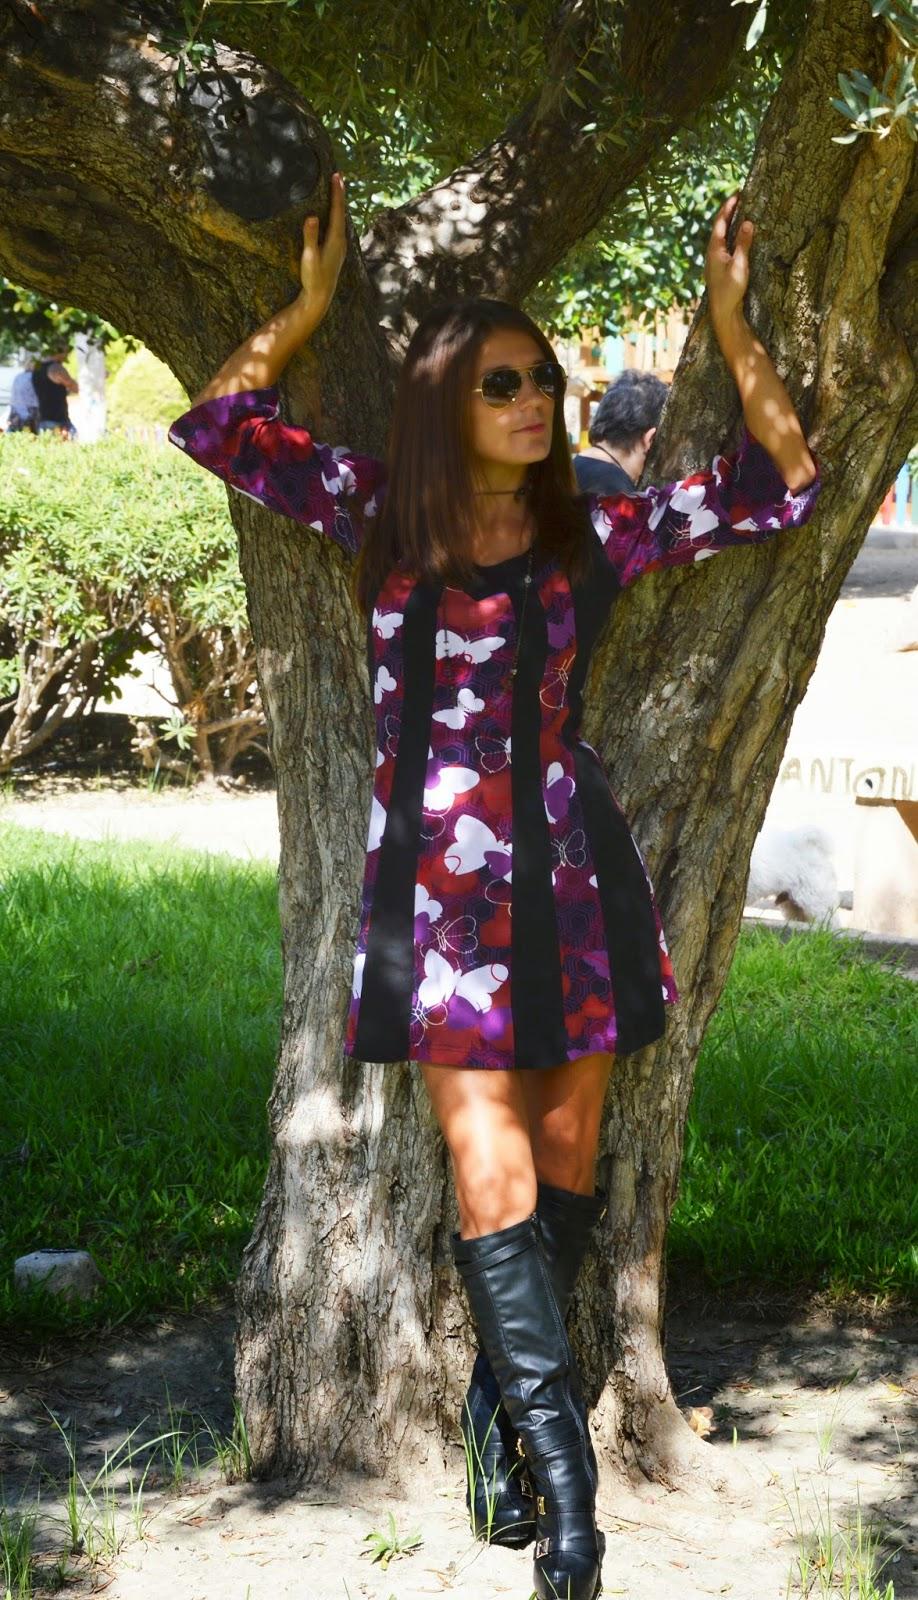 Vestidos_estampado_mariposas_otoño2014